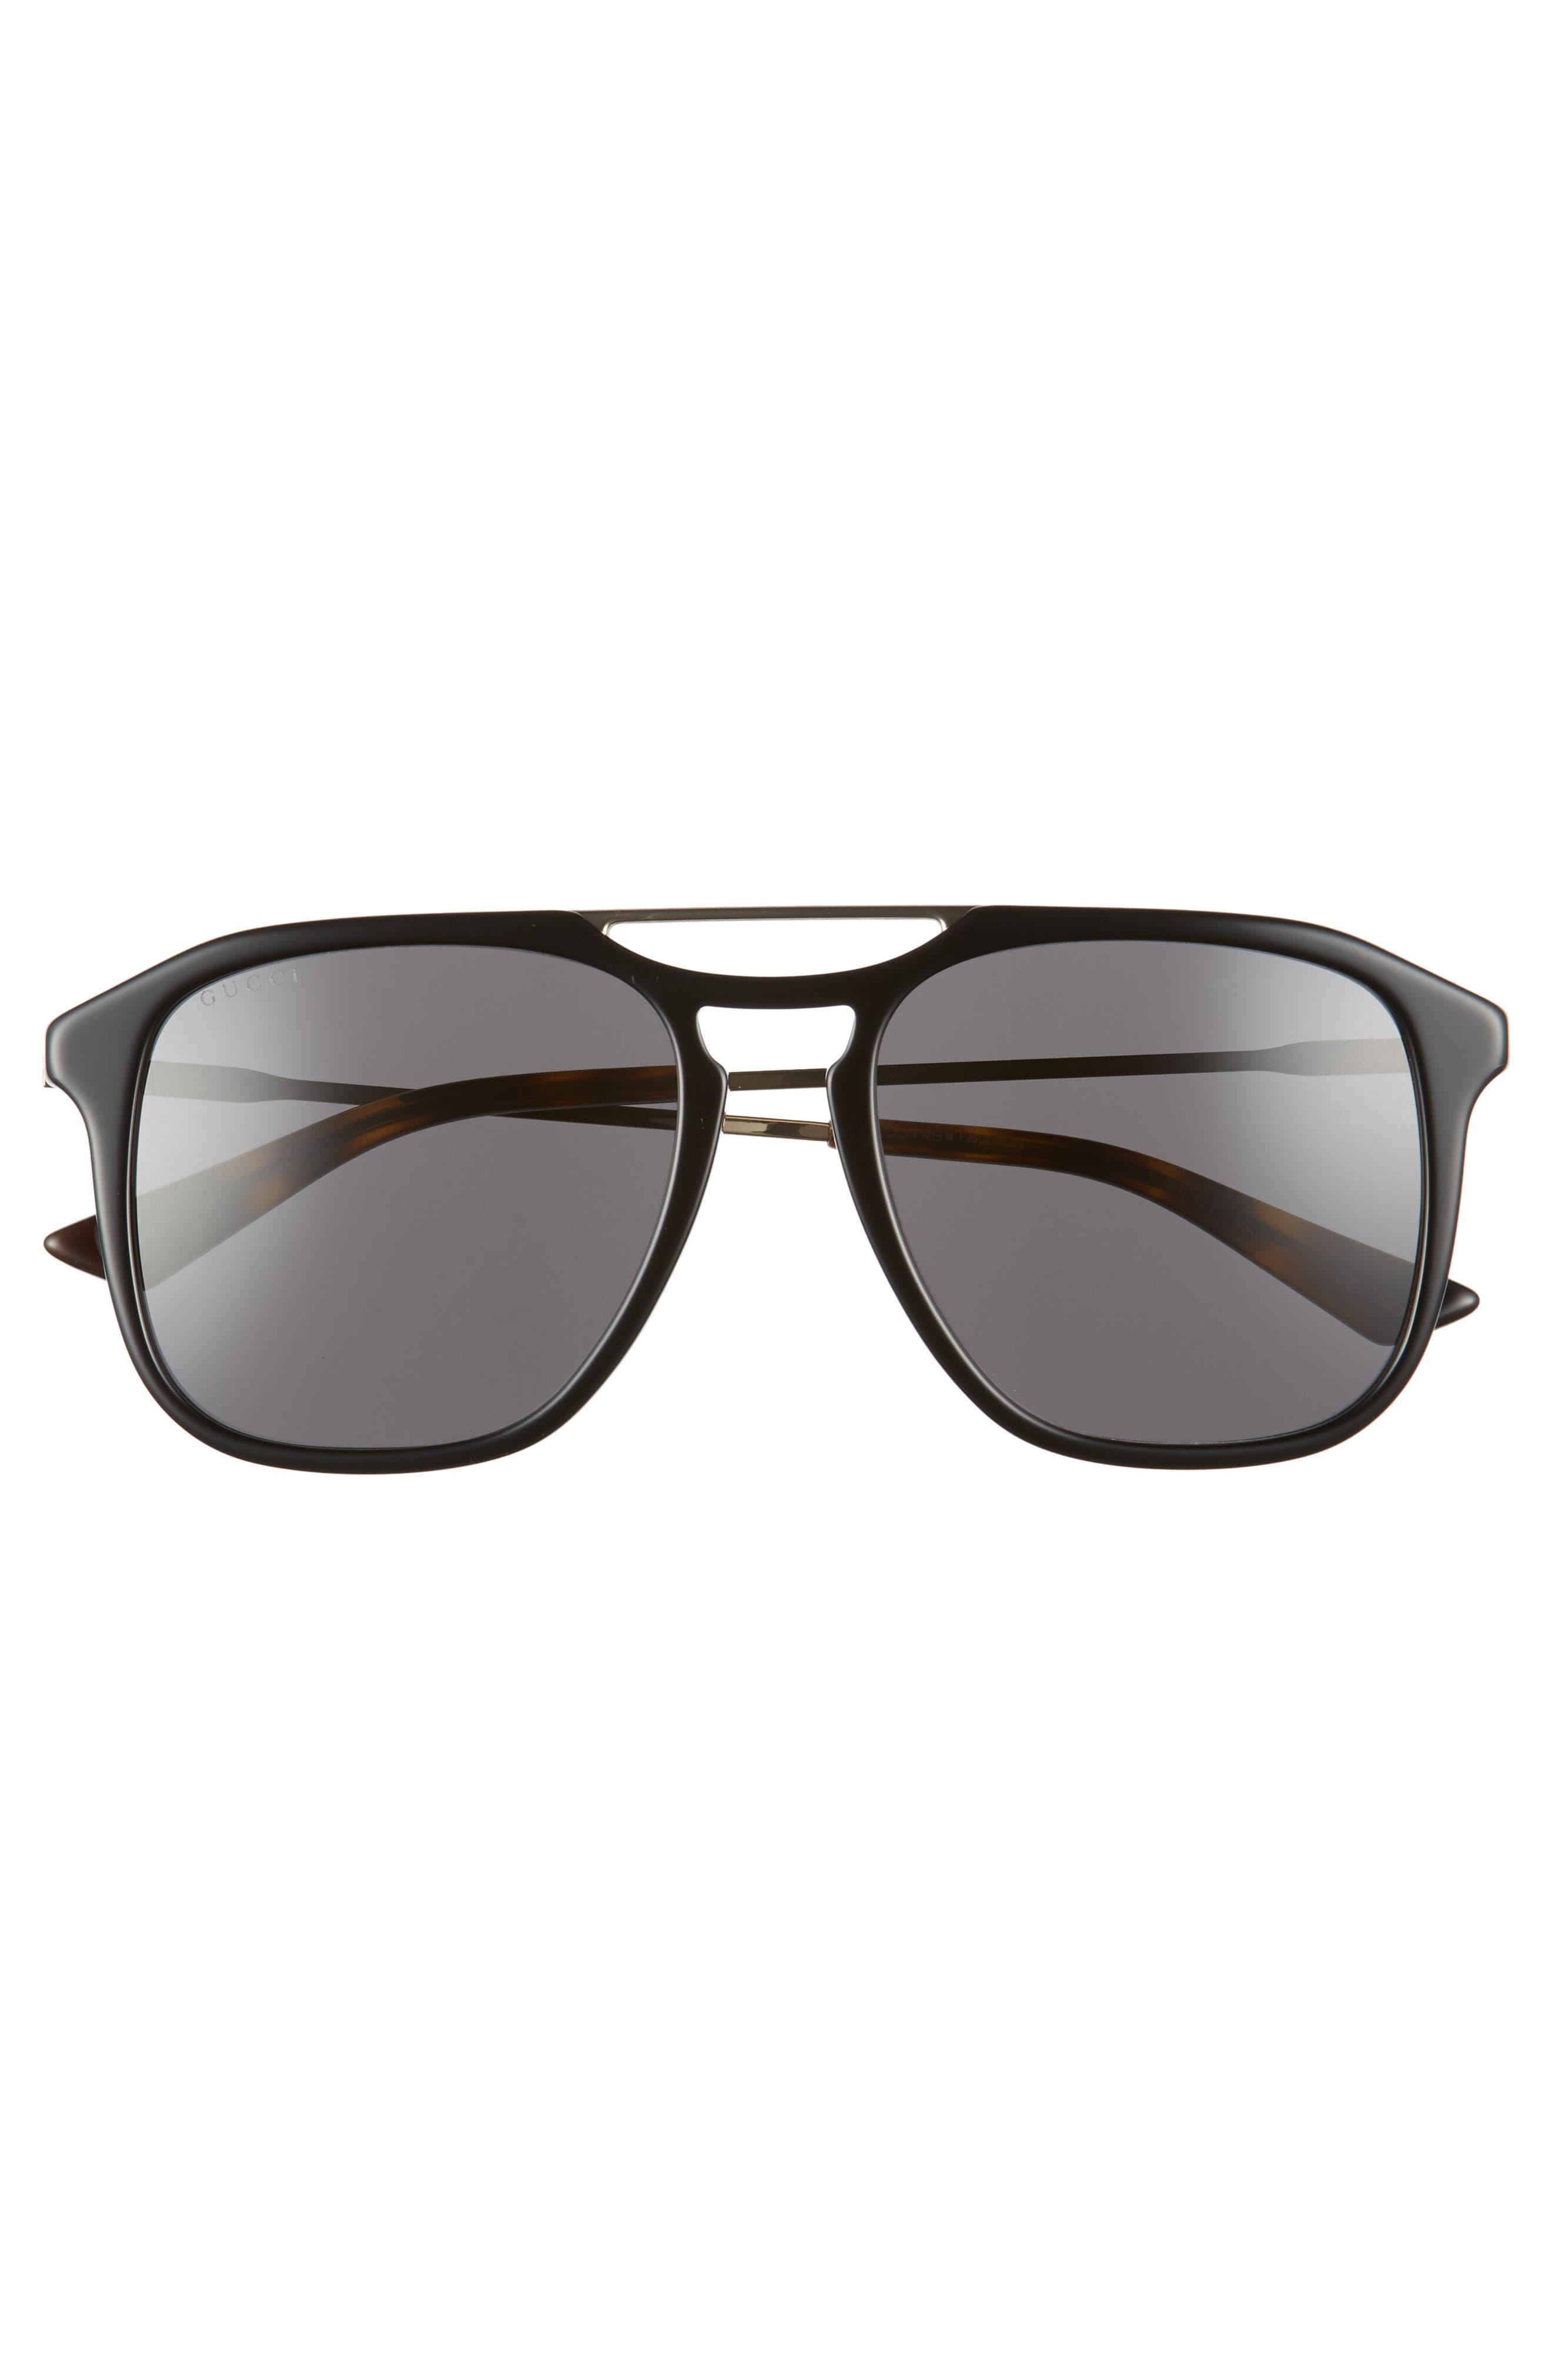 Light Combi 55mm Aviator Sunglasses,                             Alternate thumbnail 2, color,                             GOLD/ DARK HAVANA